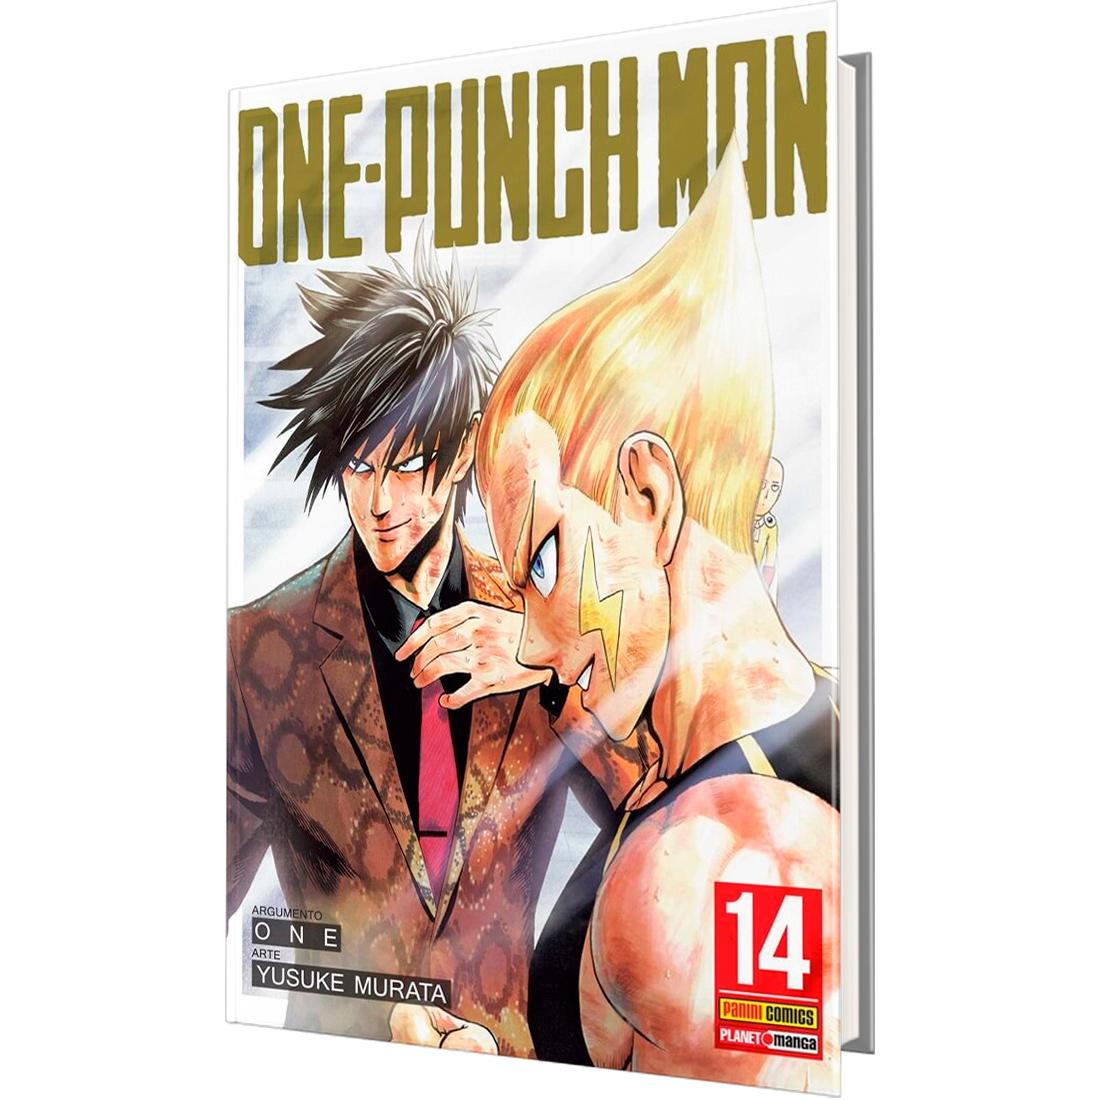 One Punch-Man Vol. 14